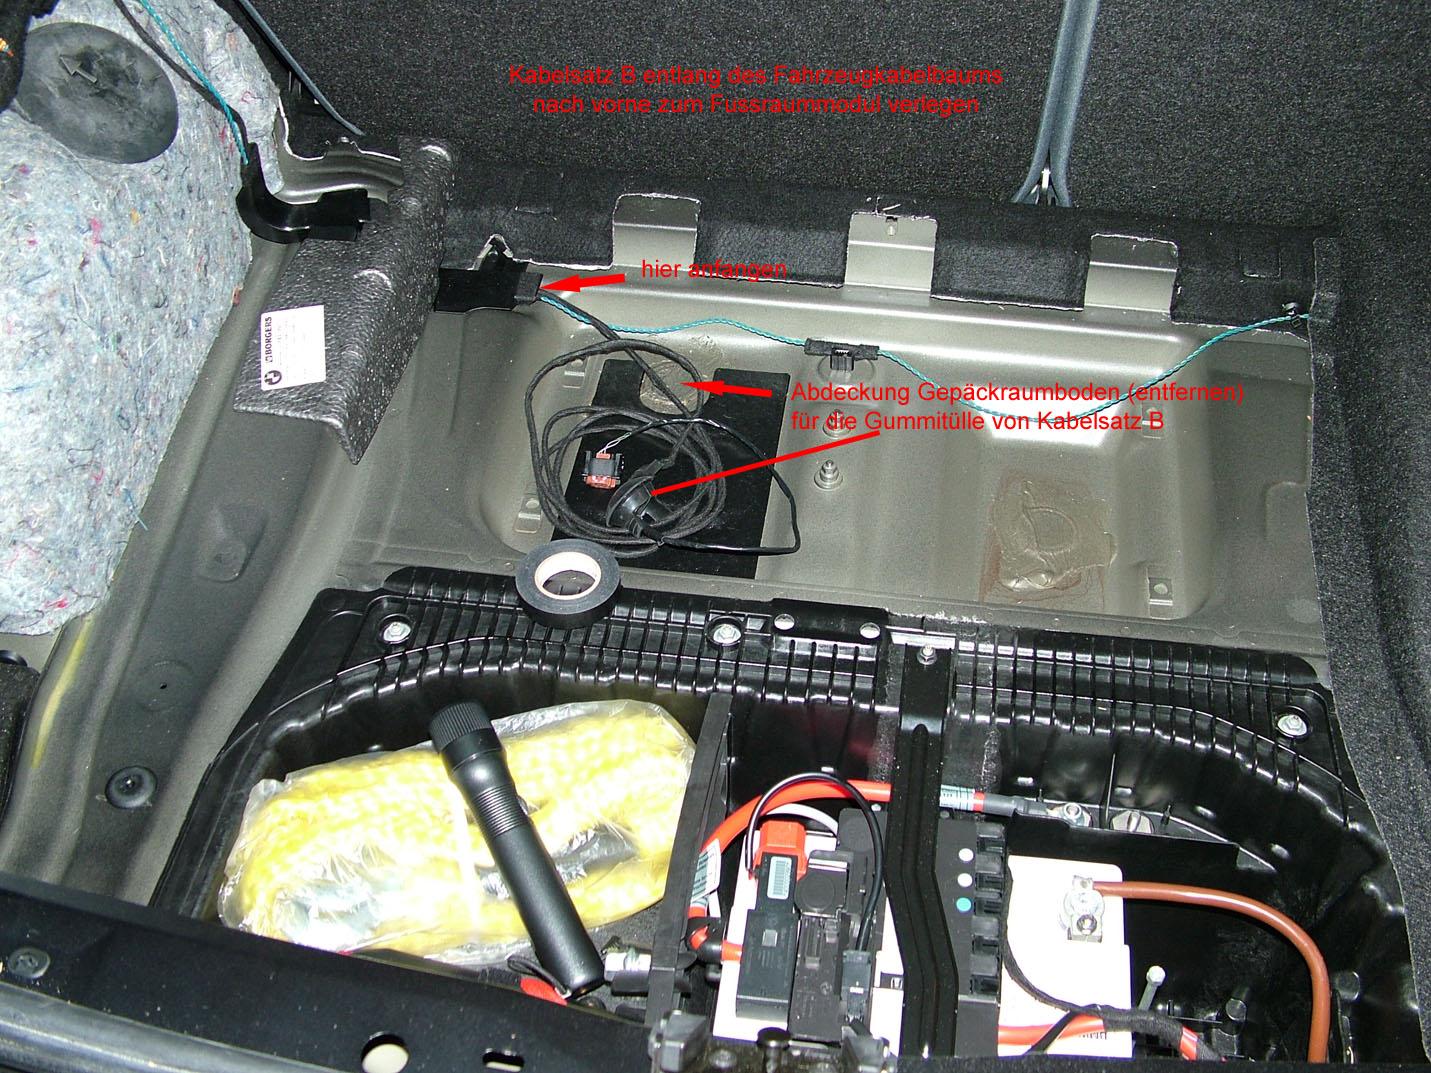 Kabelsatz_B1.jpg